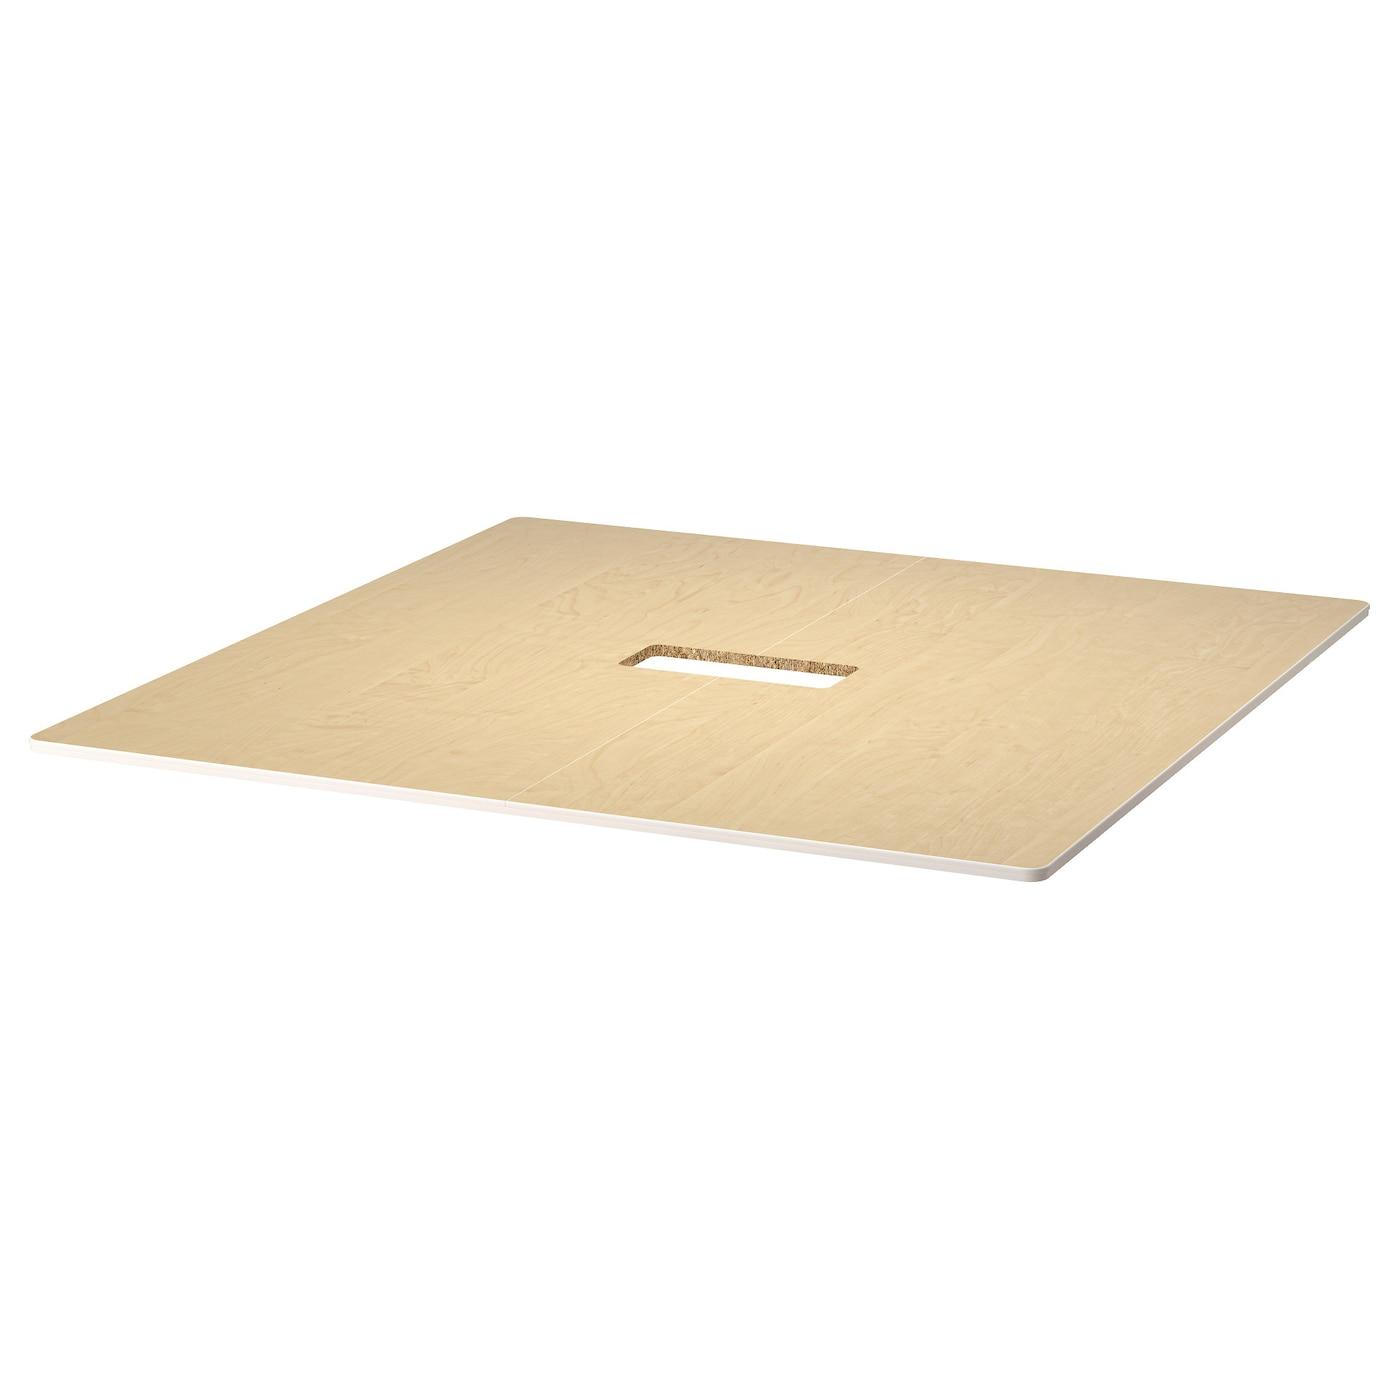 Bekant table top birch veneer 140x140 cm ikea for Table 140x140